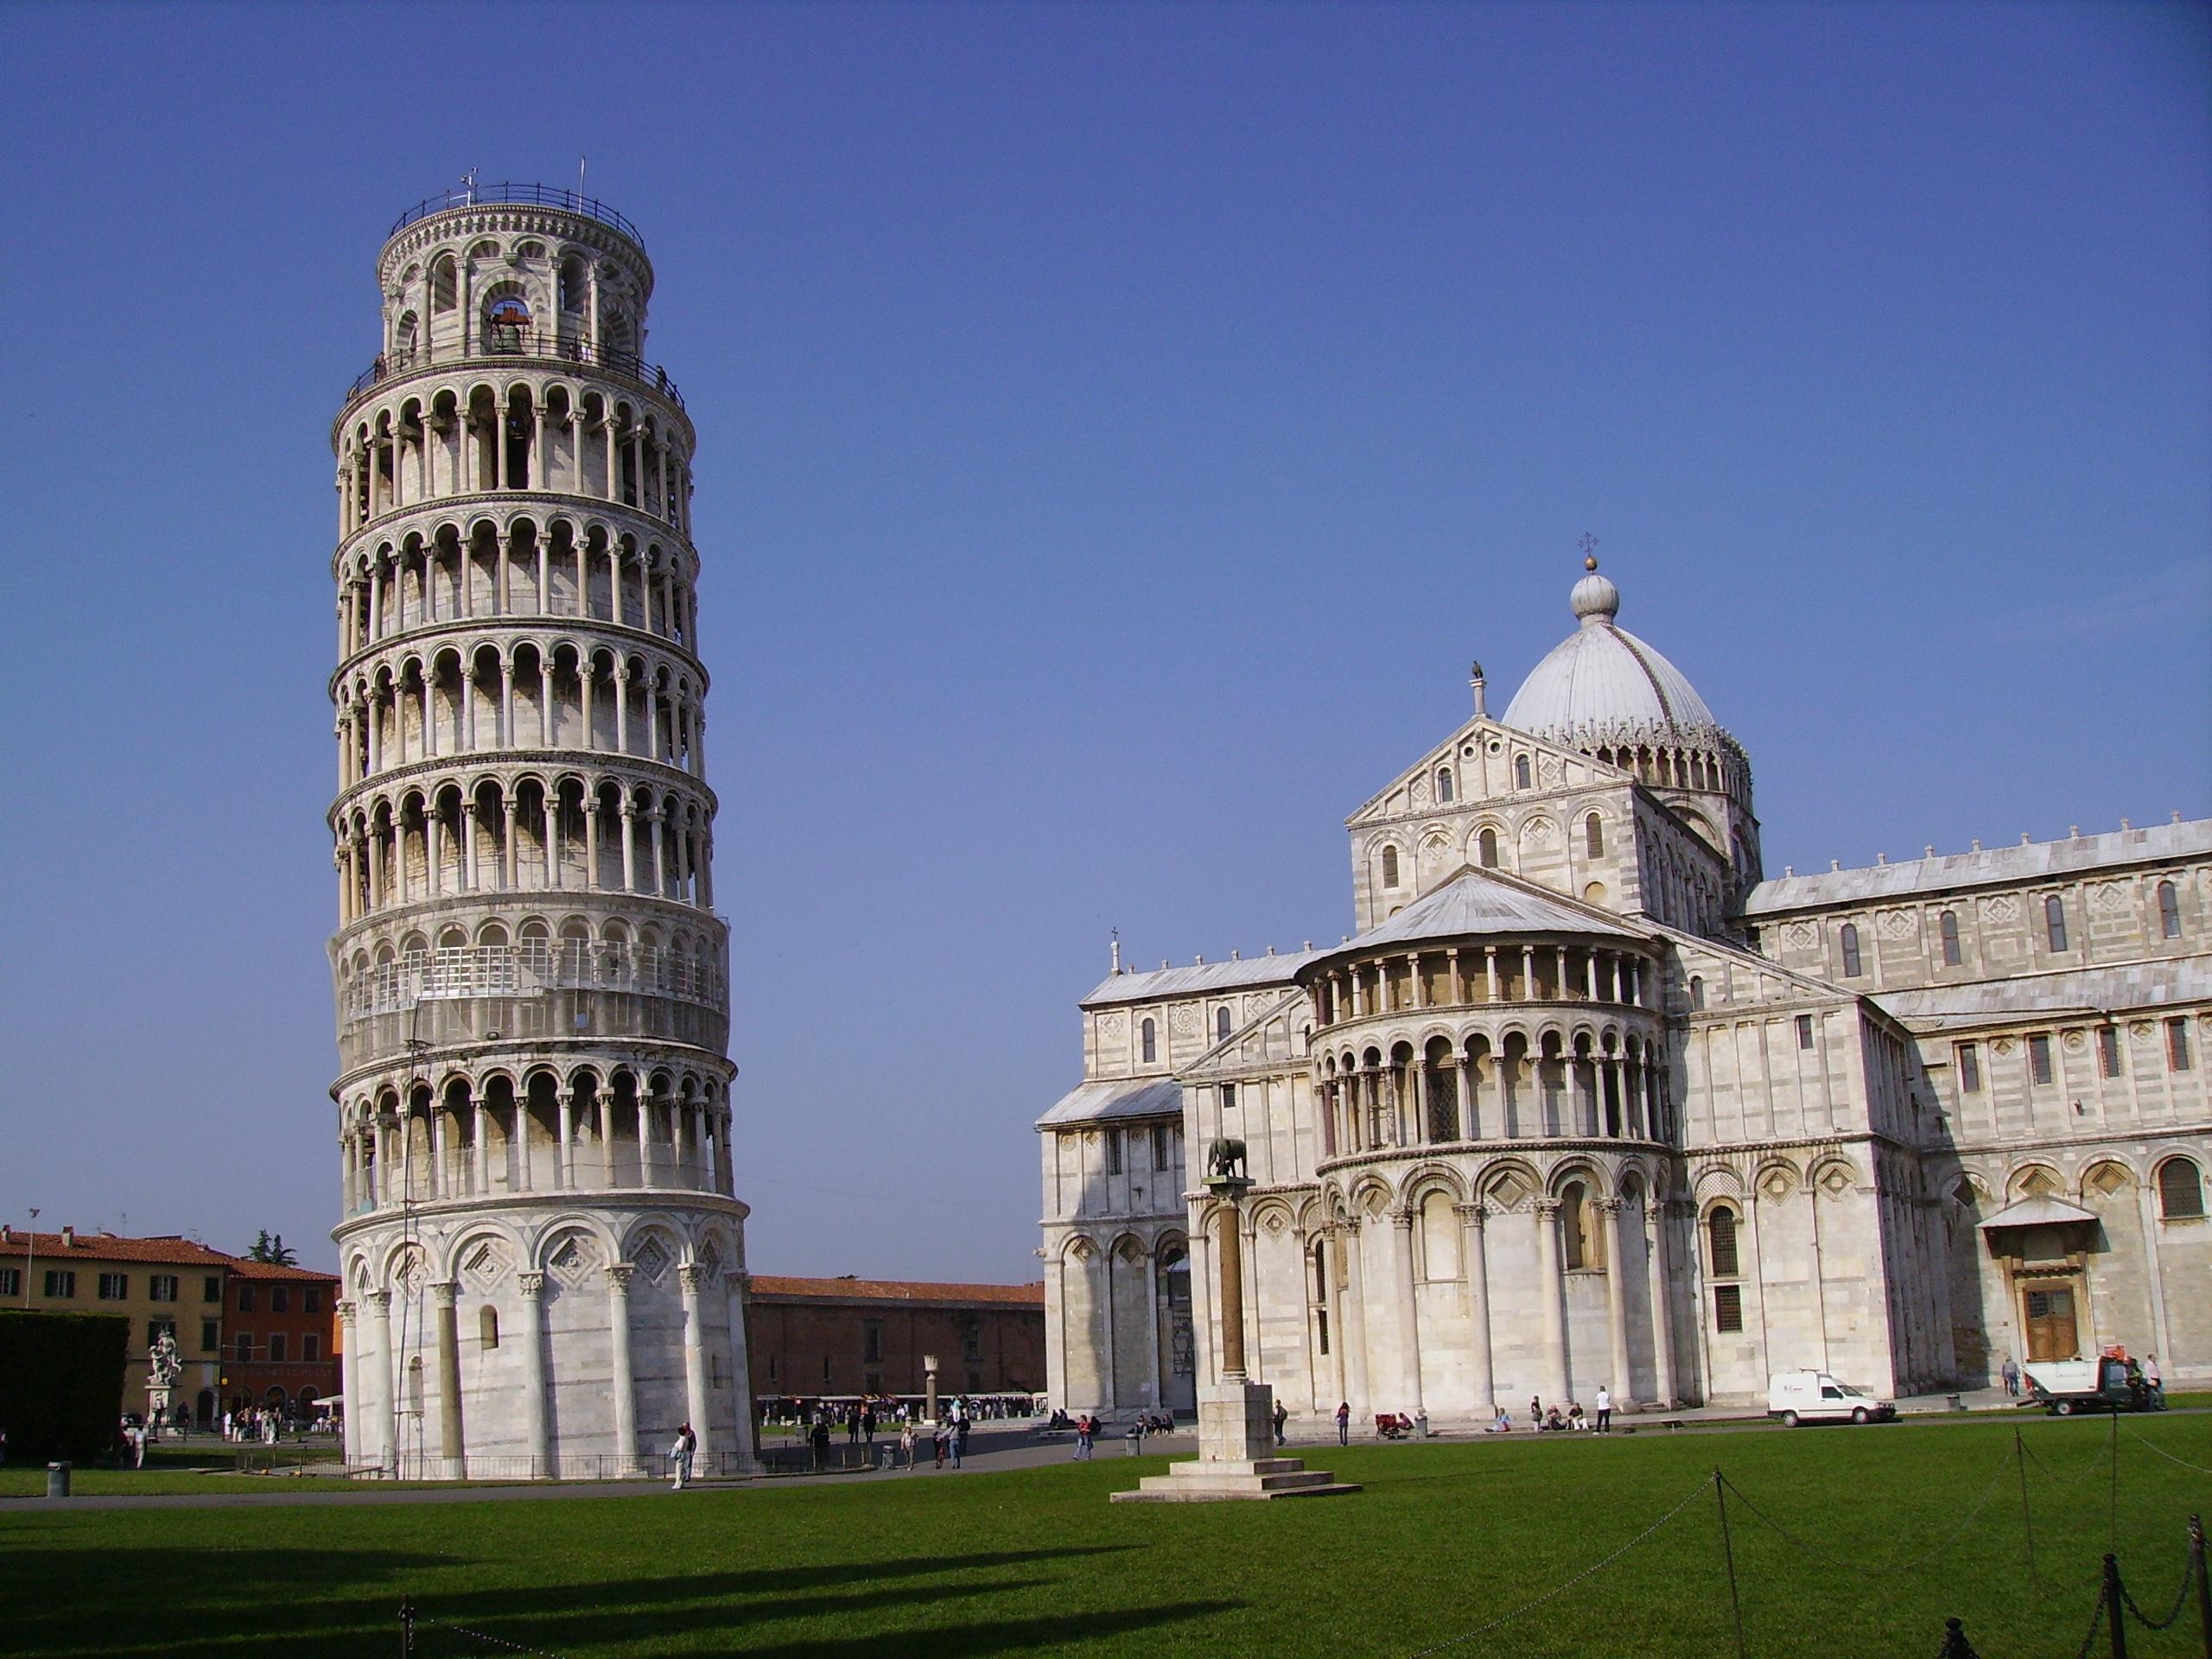 Leaning Tower Of Pisa Wallpaper